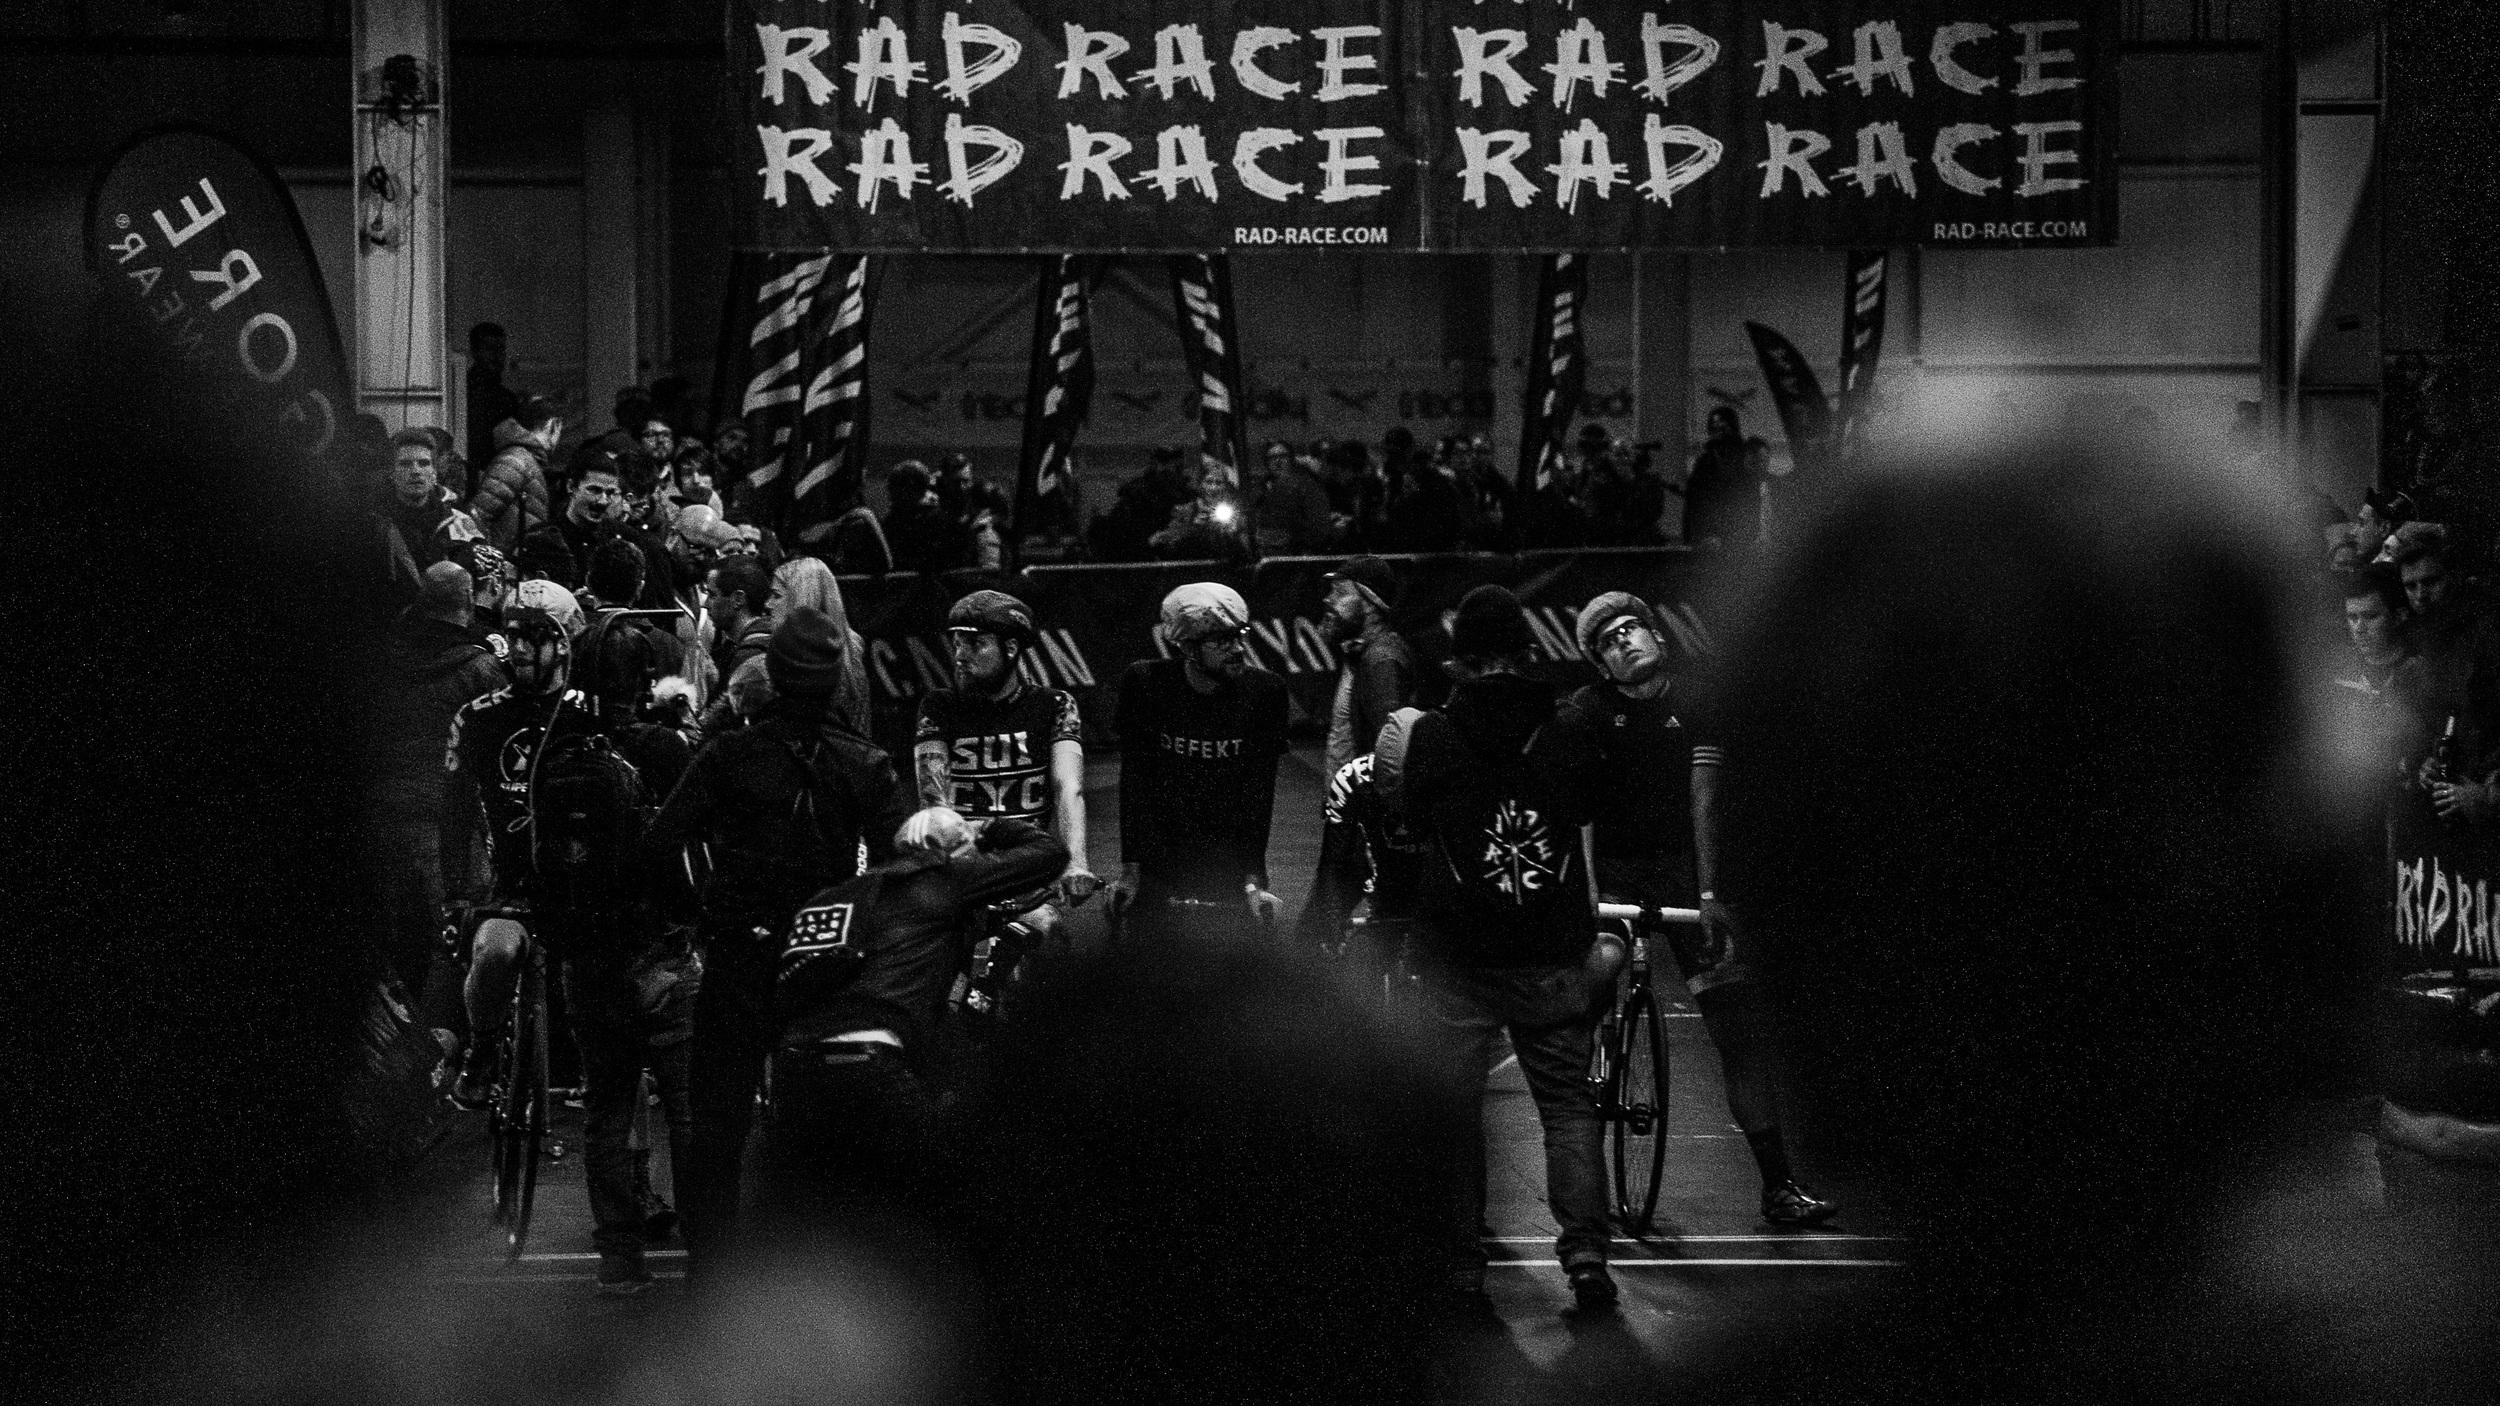 RAD RACE Last Man Standing, Berlin March 19 2016 - Shot by Drew Kaplan 51.jpg